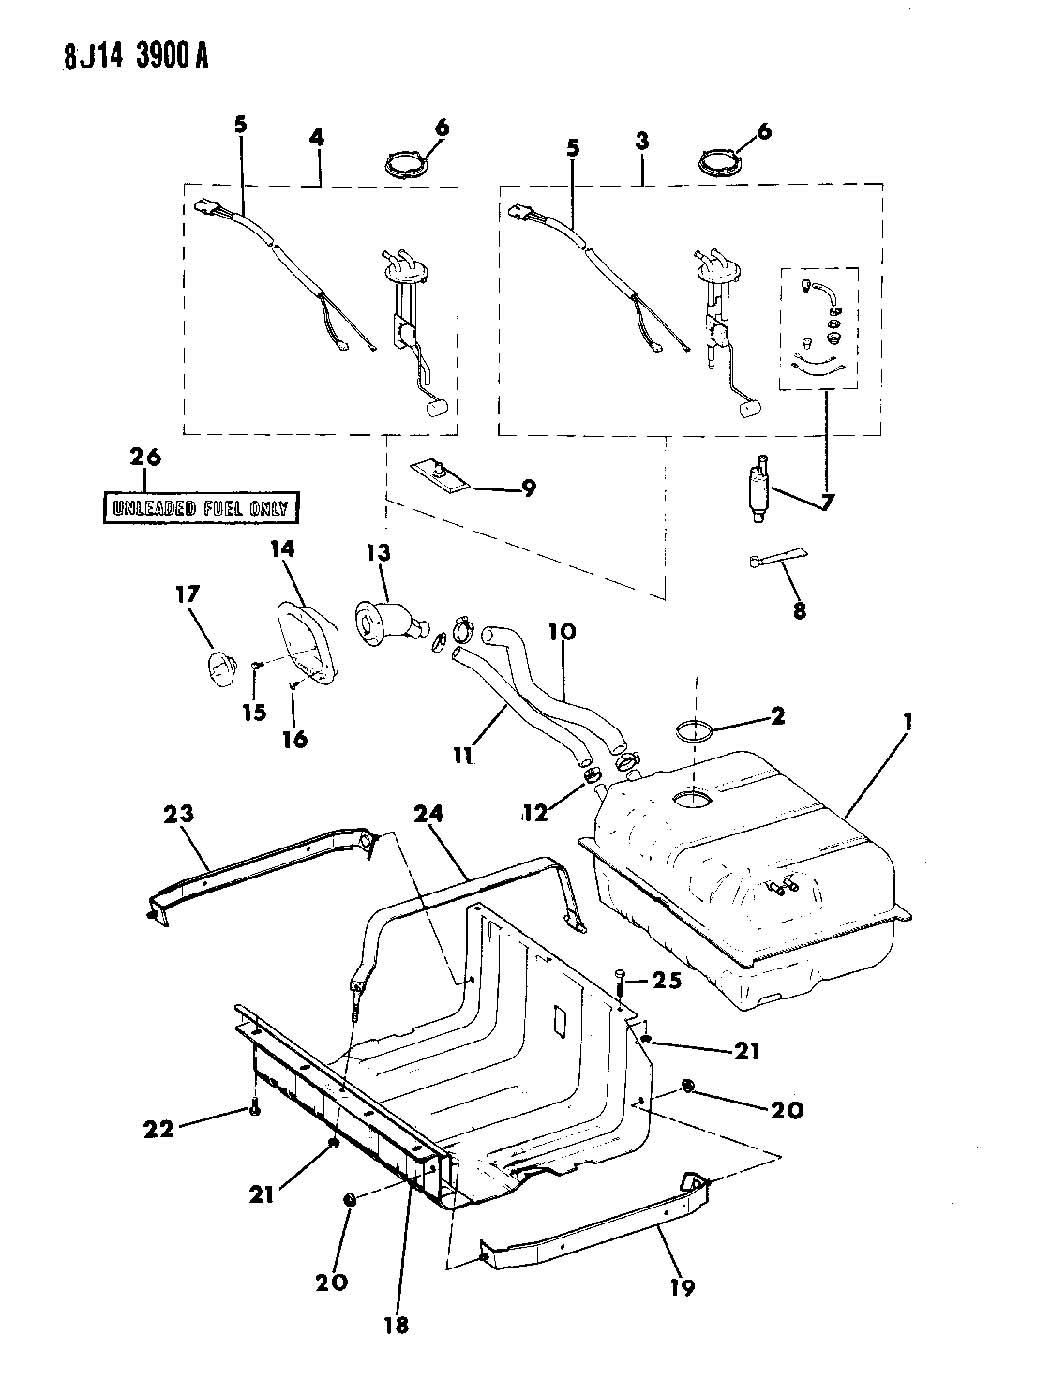 1990 Jeep Wrangler Fuel System Diagram Wiring Diagram Protocol A Protocol A Musikami It